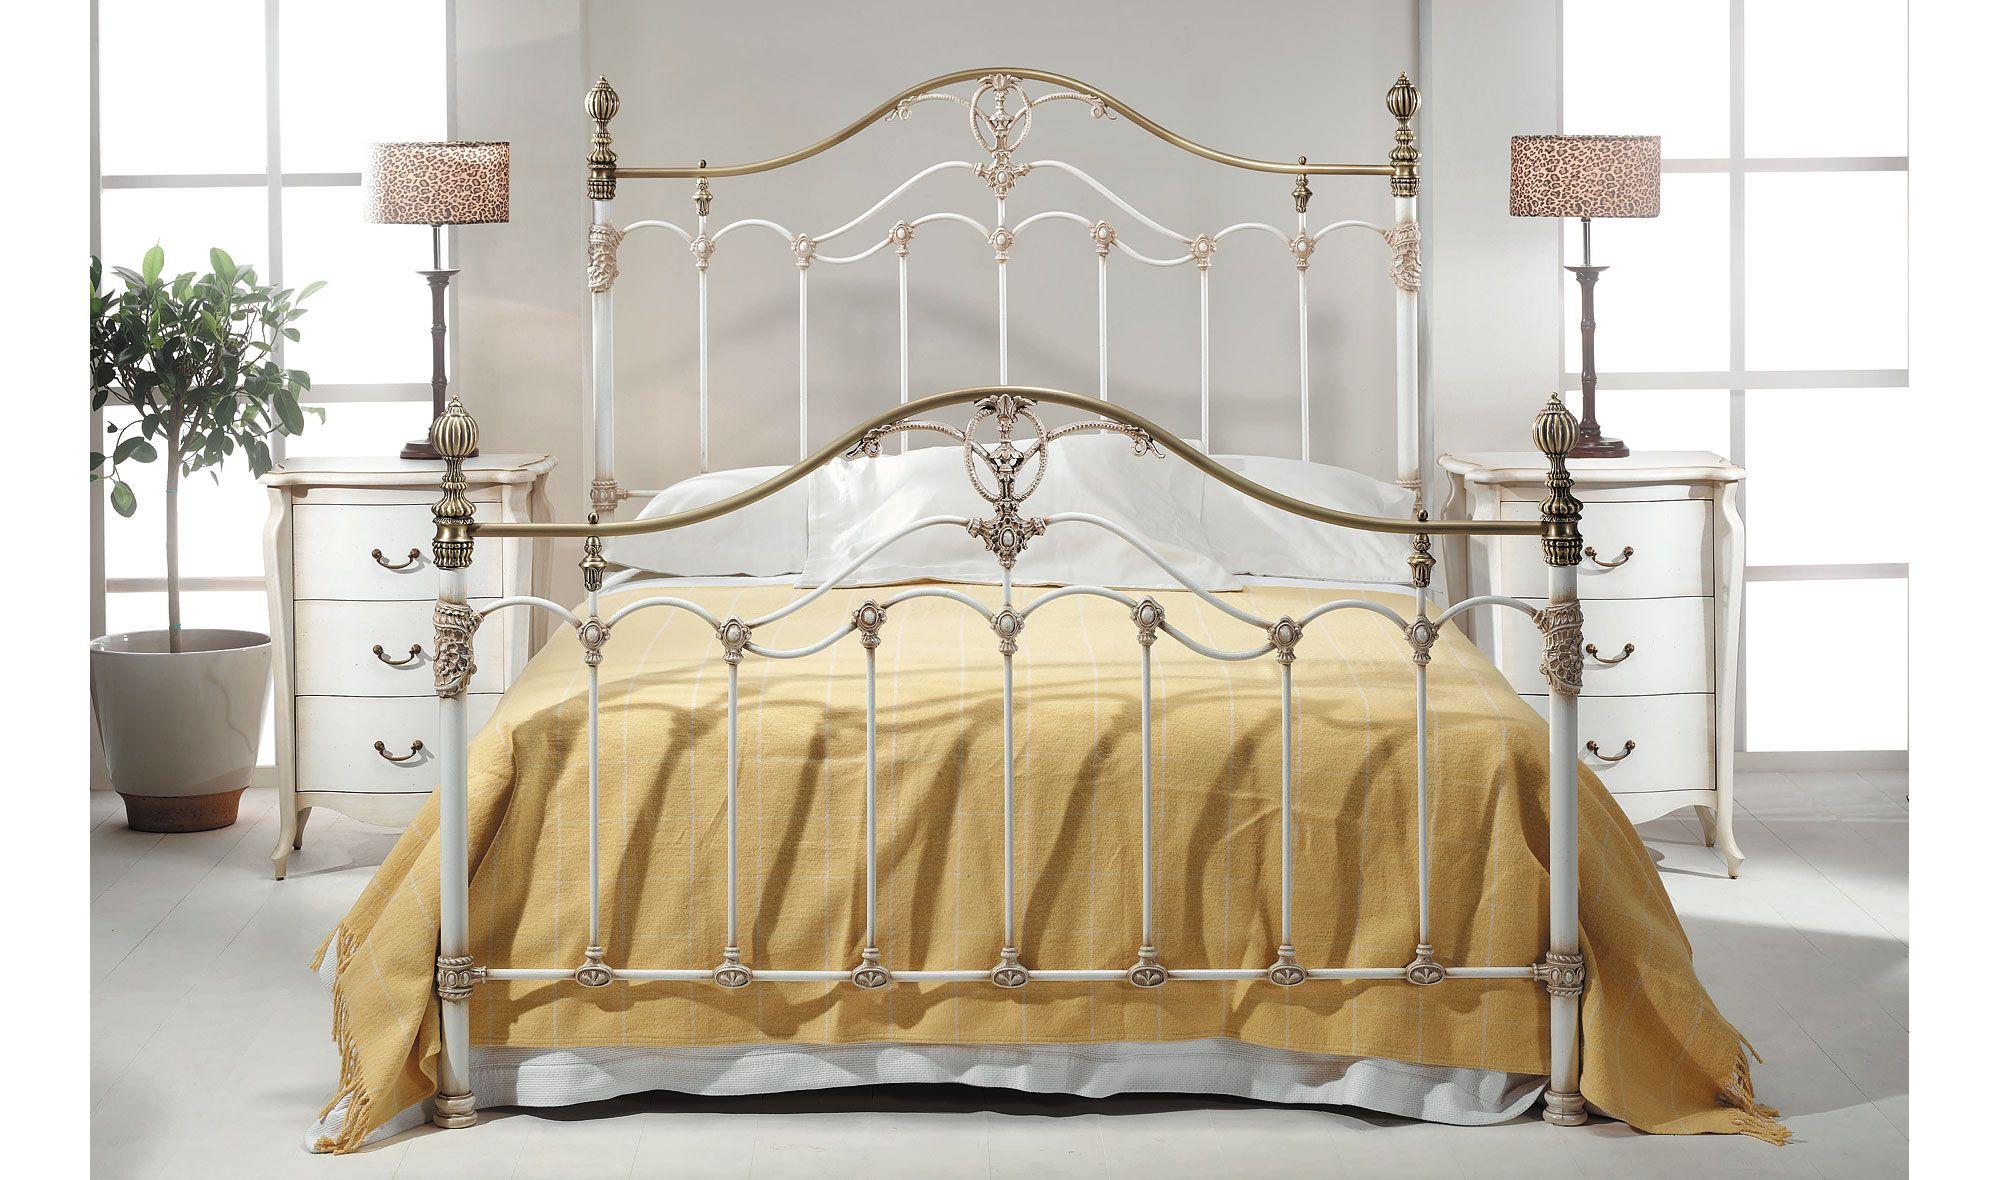 Dormitorio forja Buleria de lujo en Portobellodeluxe.com. Tu tienda ...